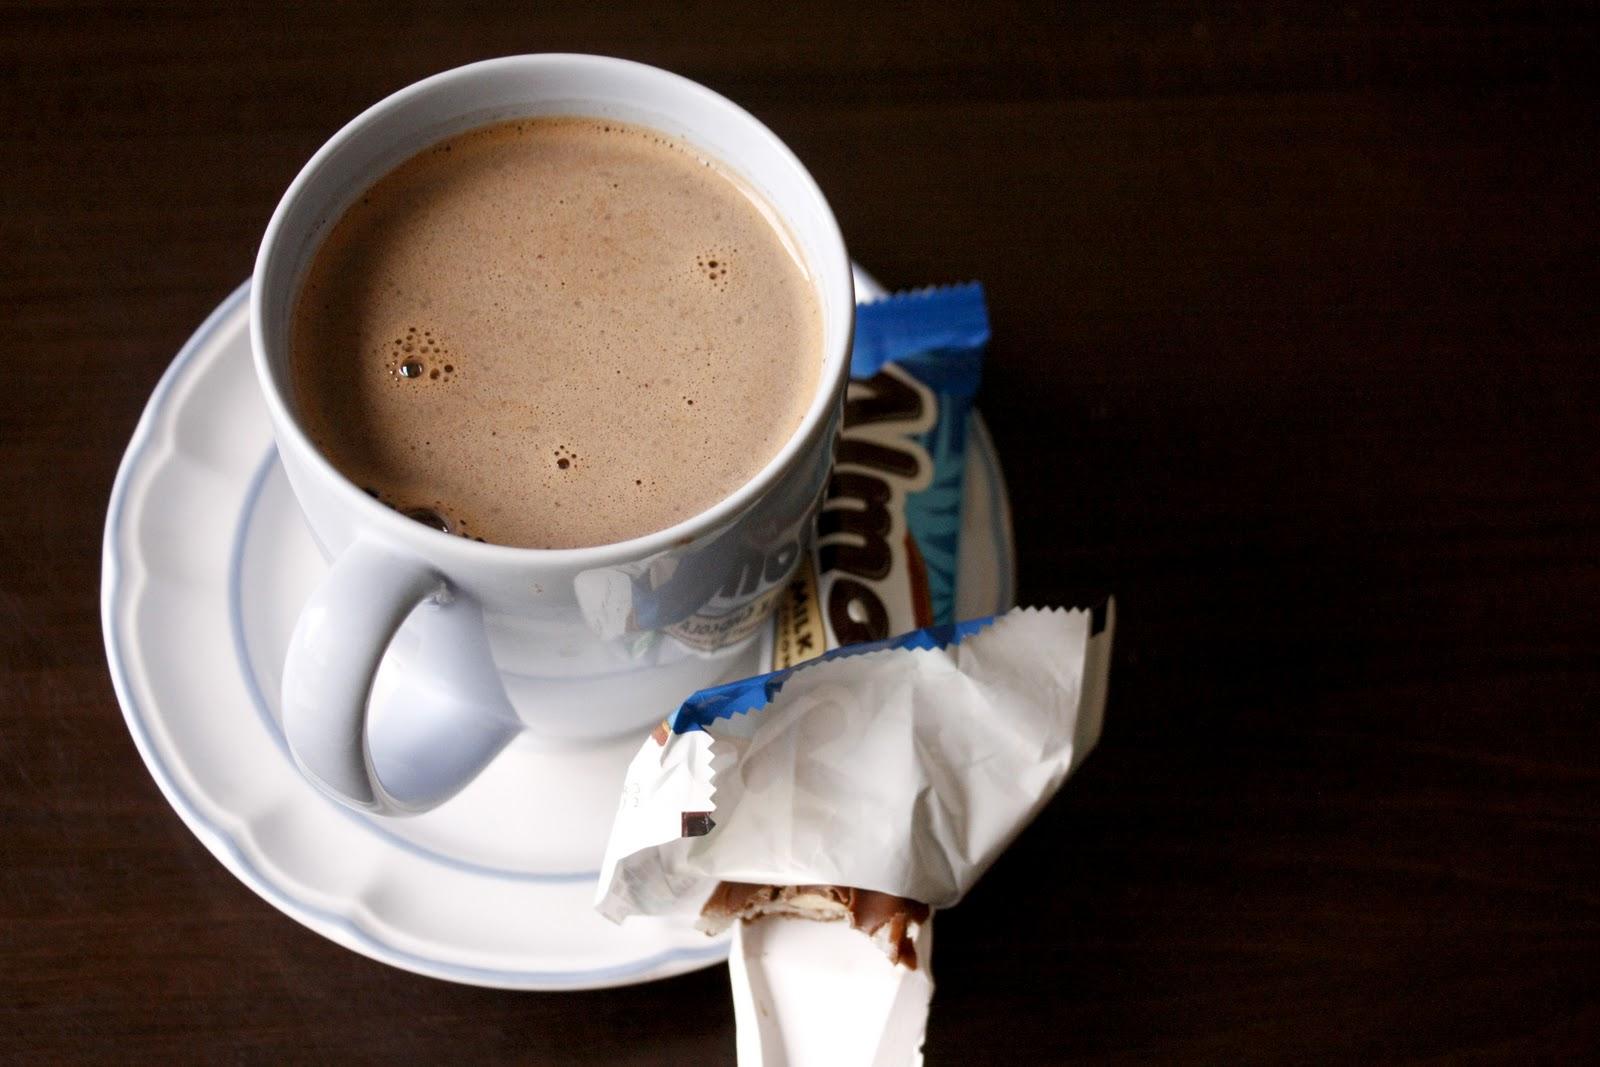 Almond Joy Hot Chocolate1600 x 1067 jpeg 182kB